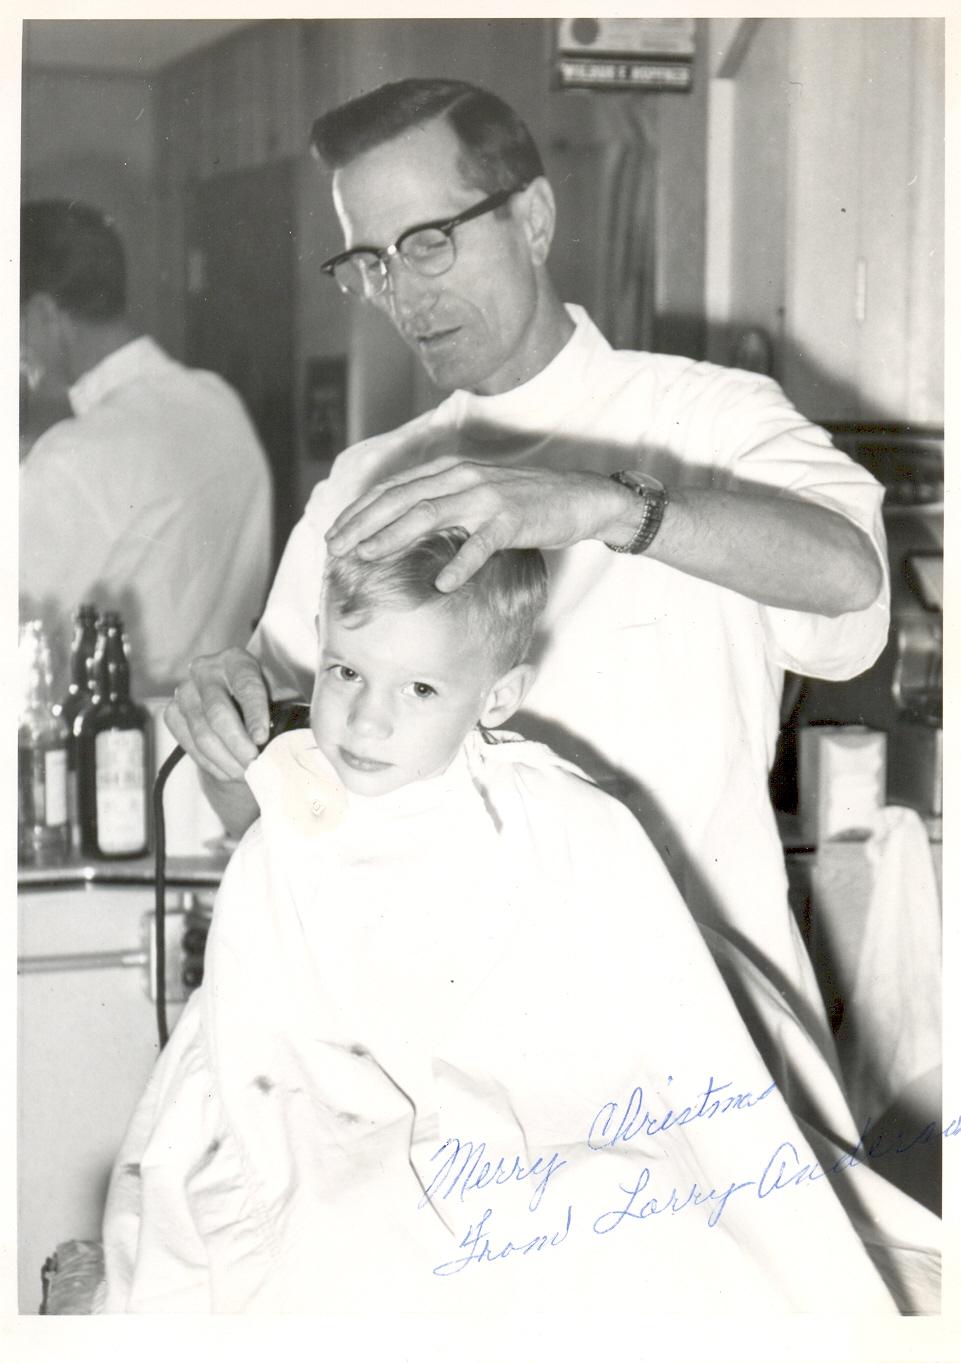 Brandon Mn History Center: Wilbur Hopfner Barber Shop Brandon MN